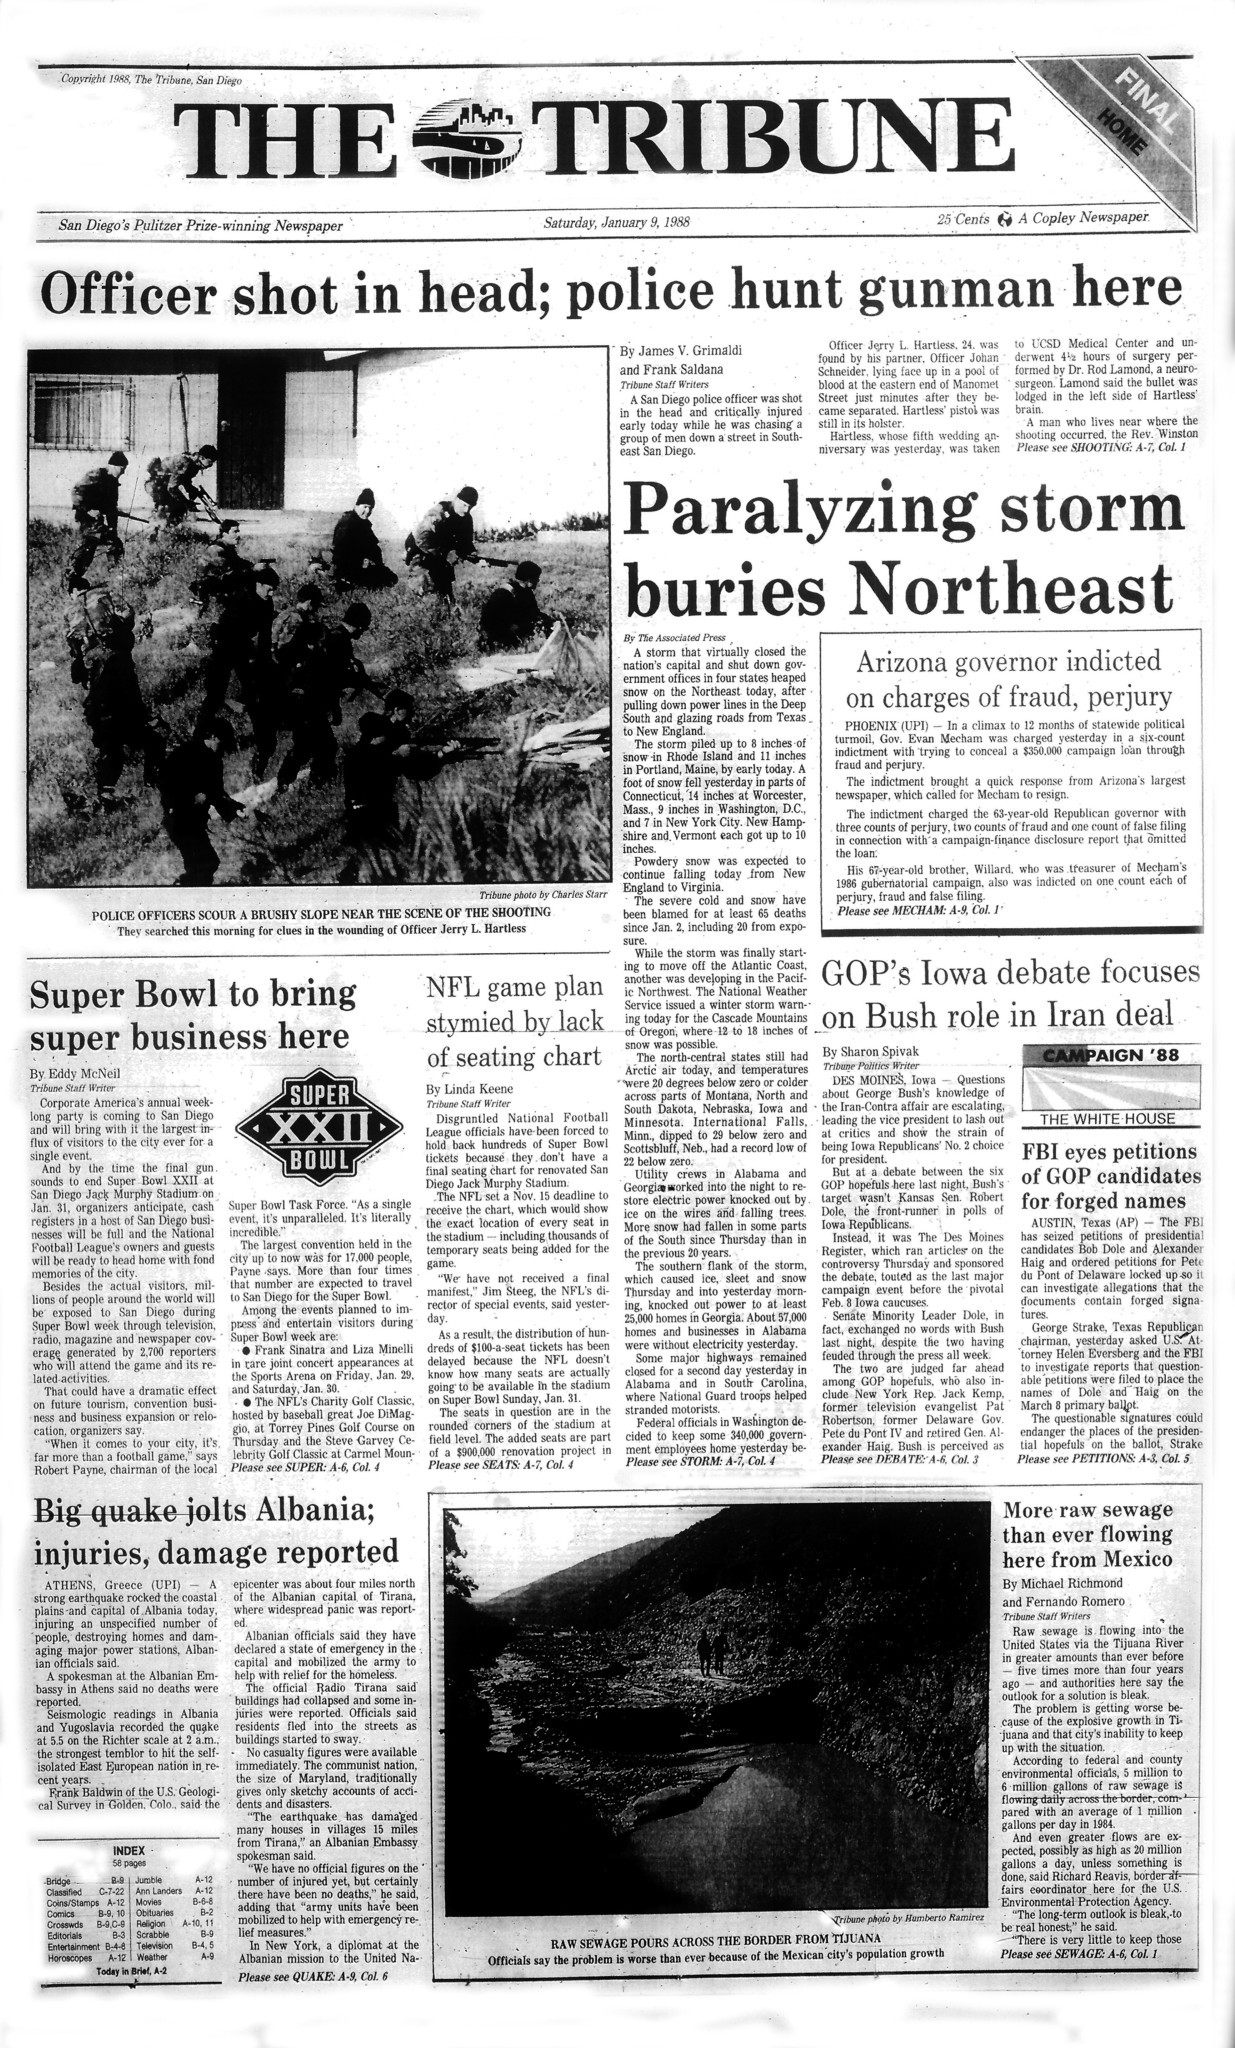 January 9, 1988